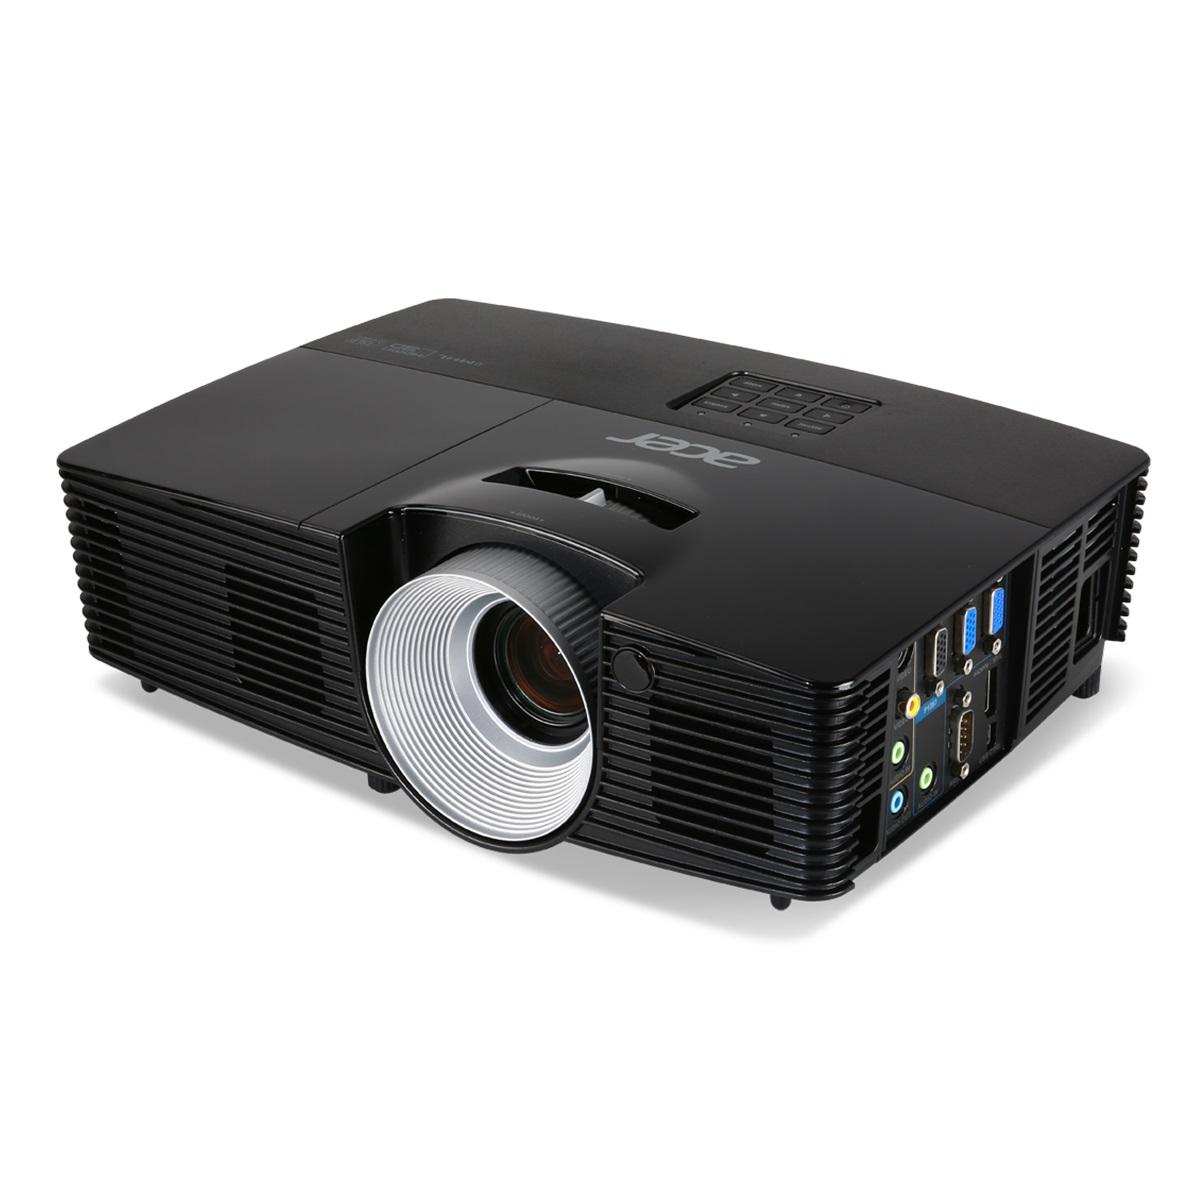 Acer P1287 / DLP / 3D / 1024x768 XGA / 4200 ANSI / 17000:1 / VGA / HDMI(MHL) / 1x10W repro / 2,5KG